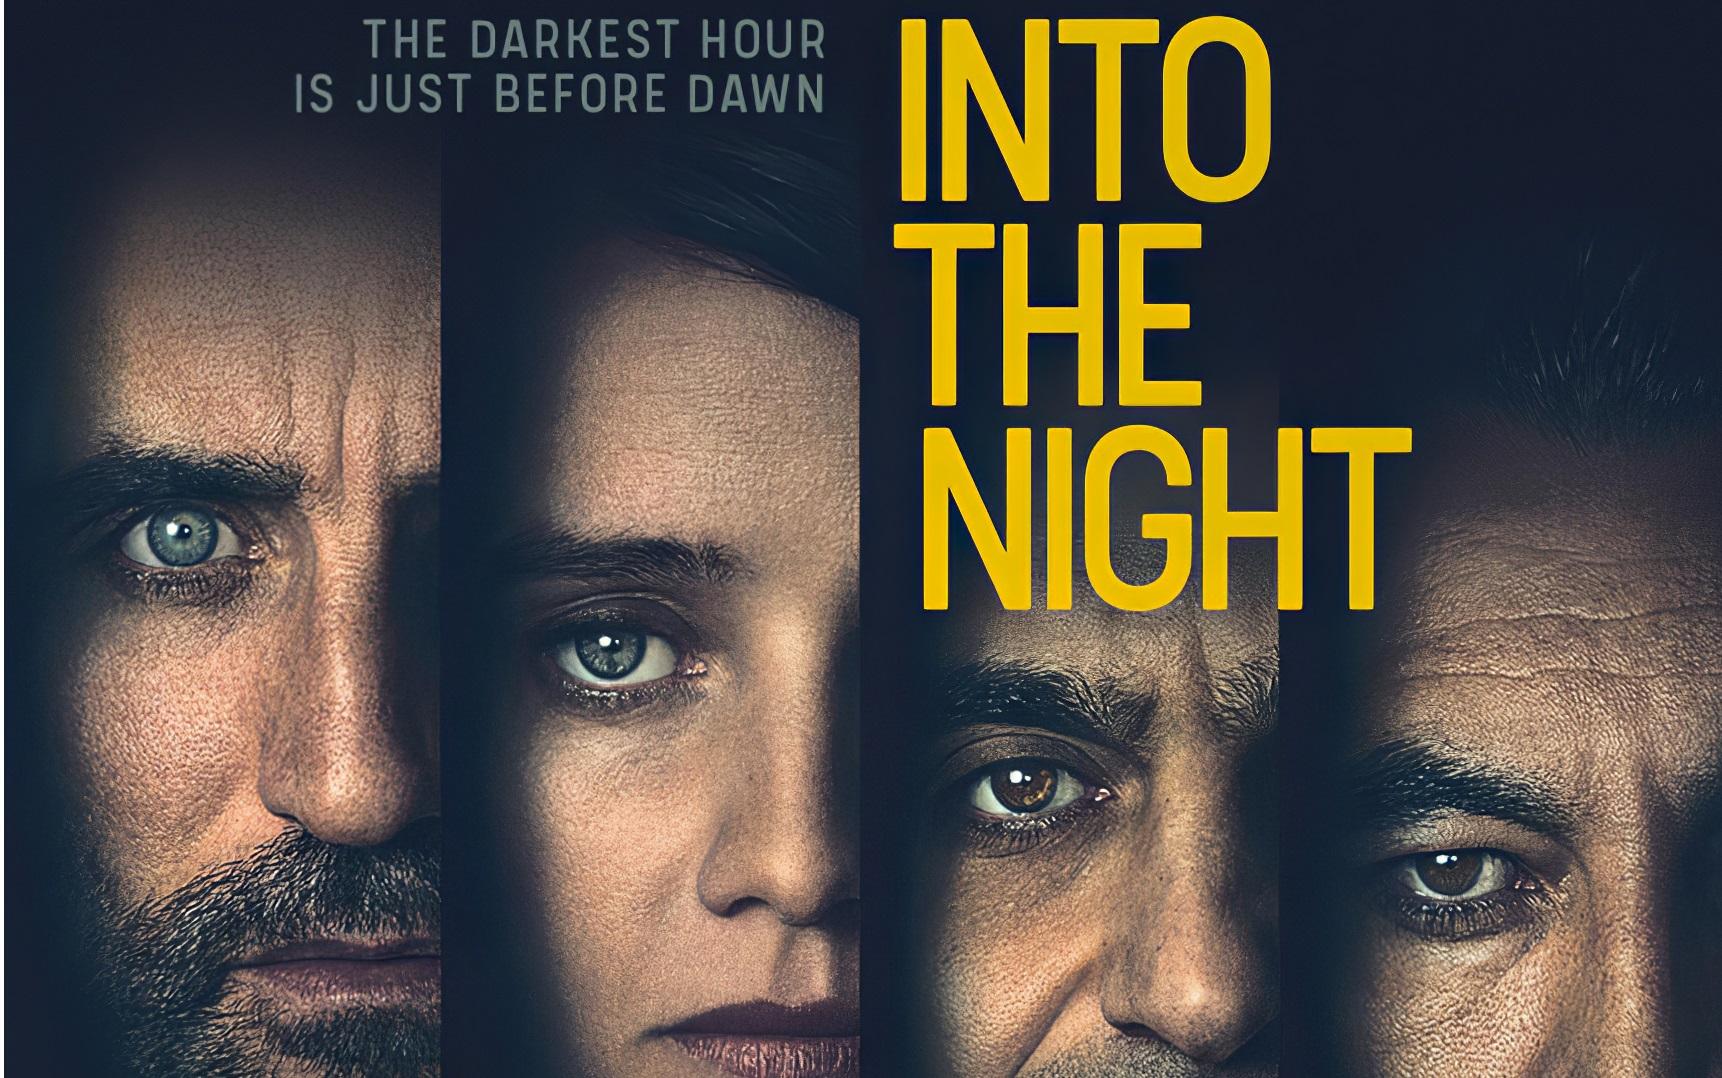 Into the night - kierunek noc